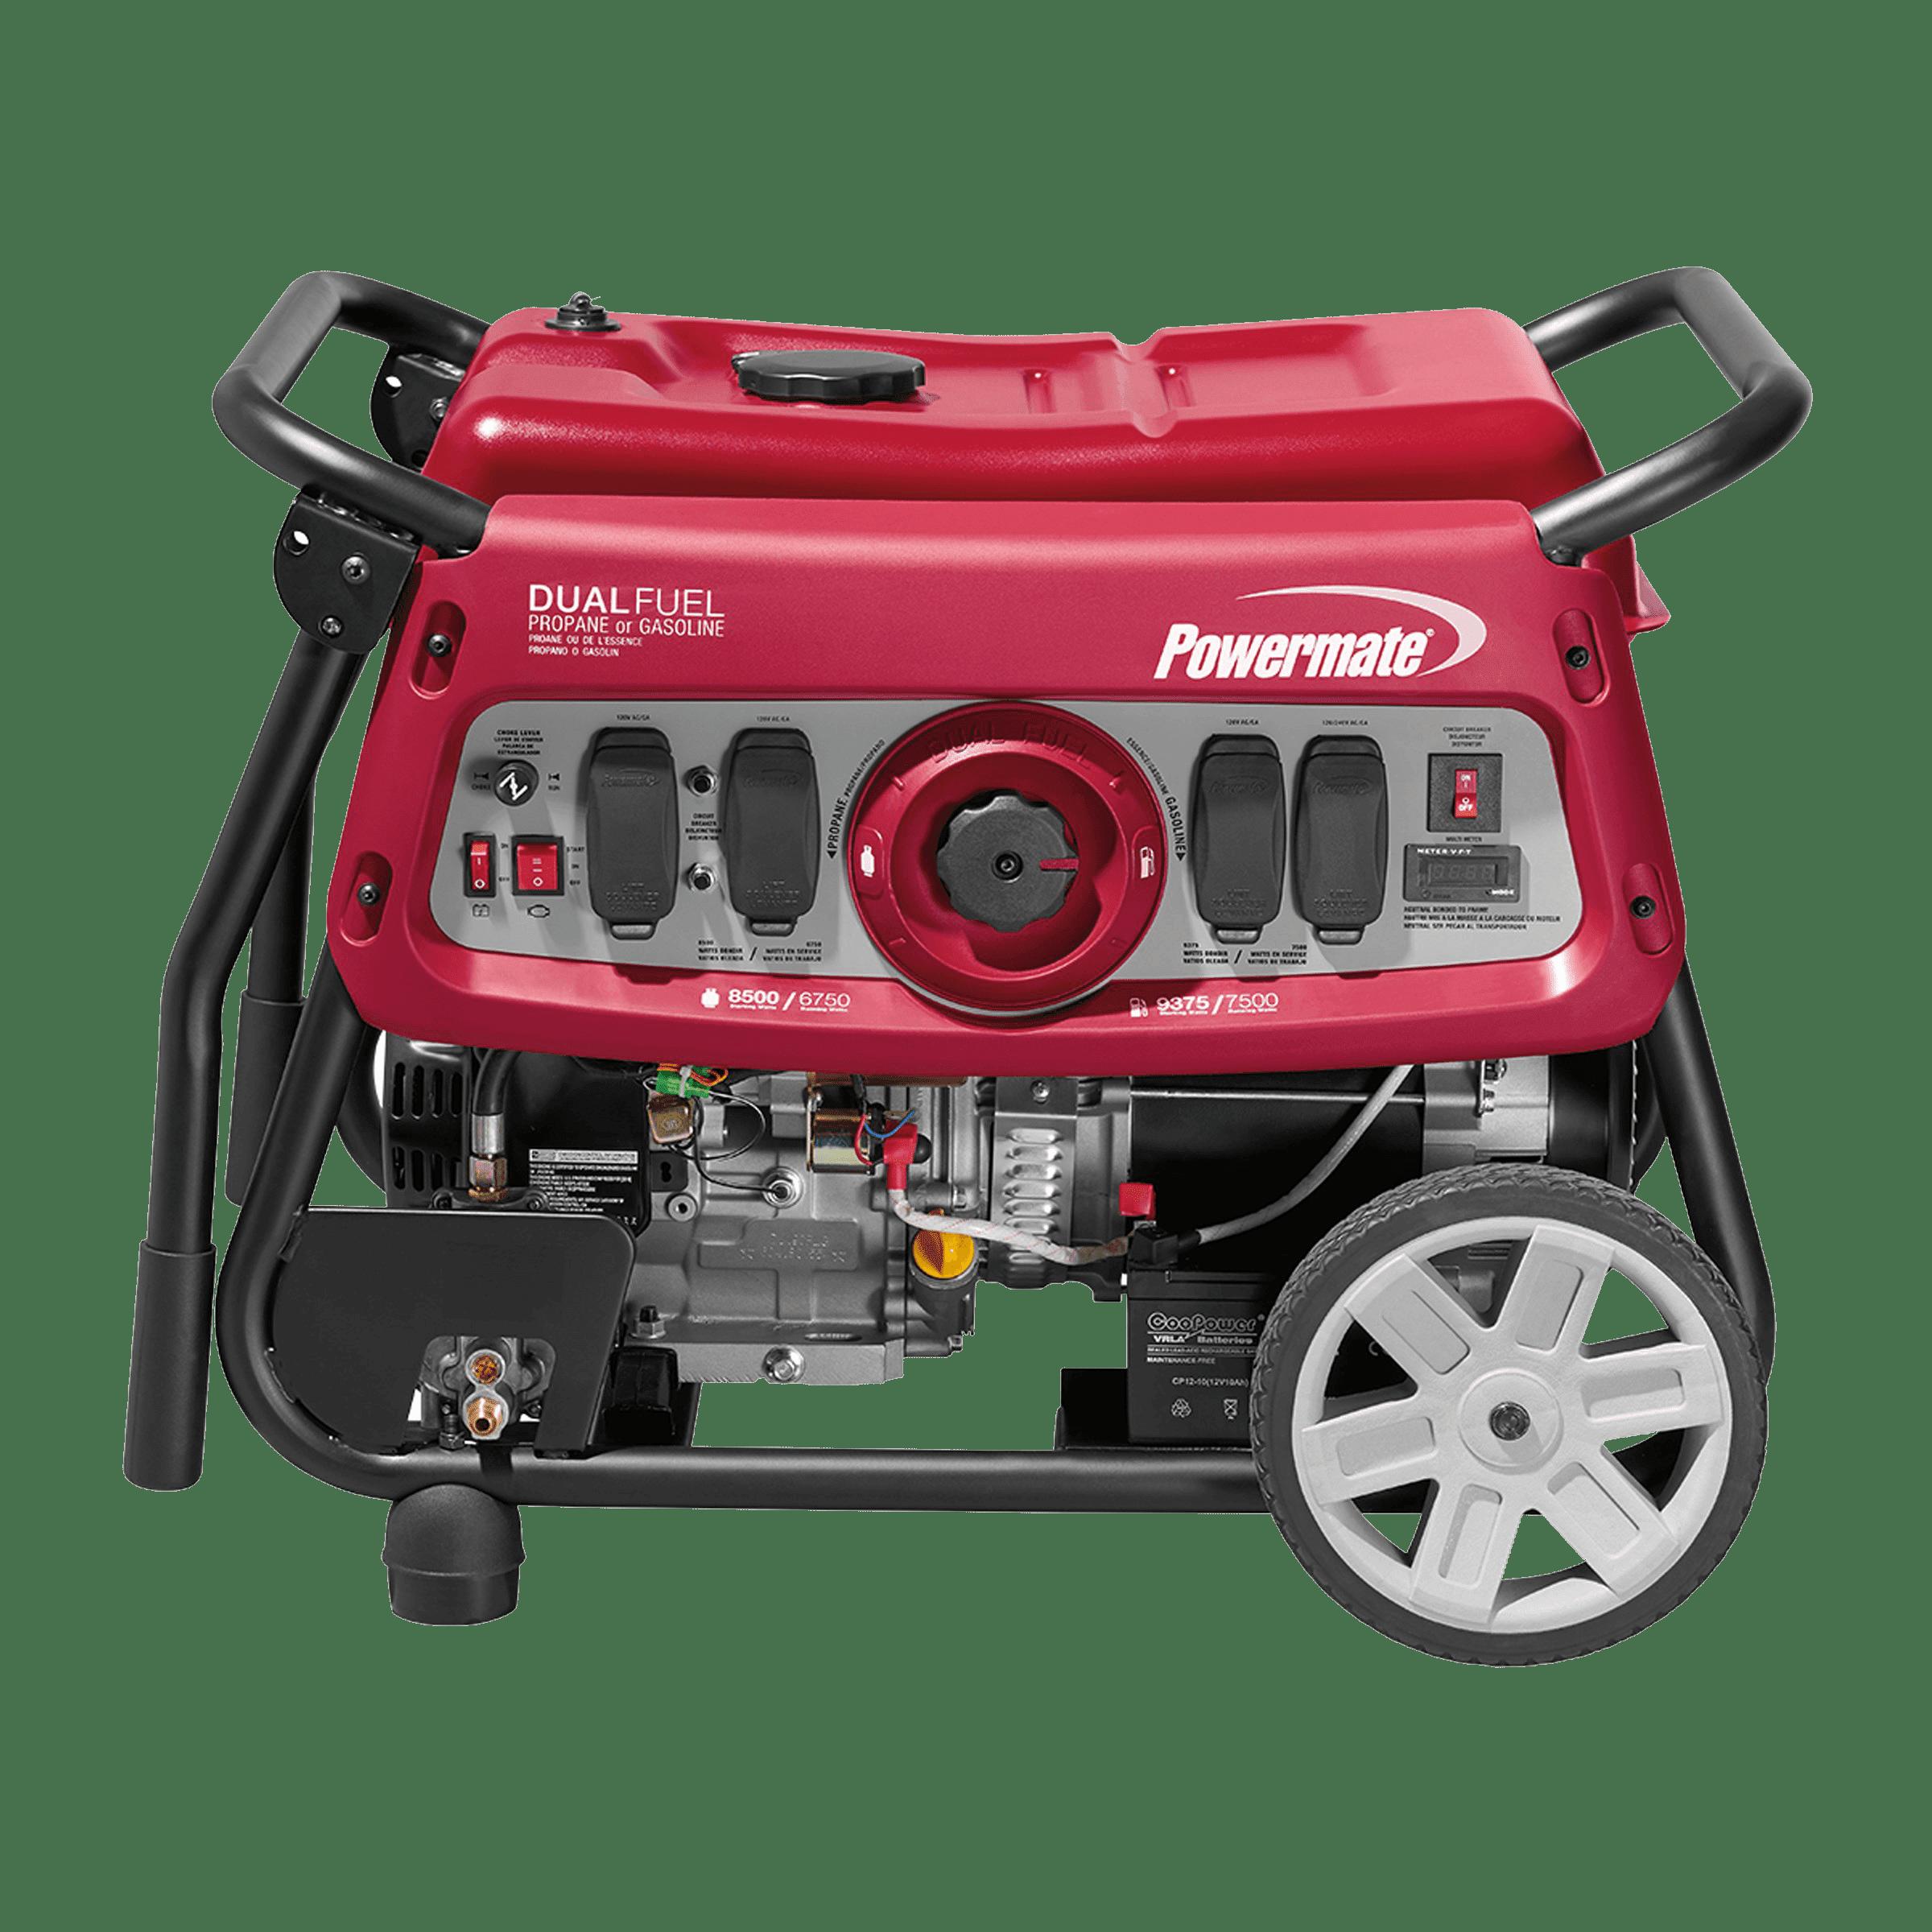 Powermate Dual Fuel 7500E Portable Generator